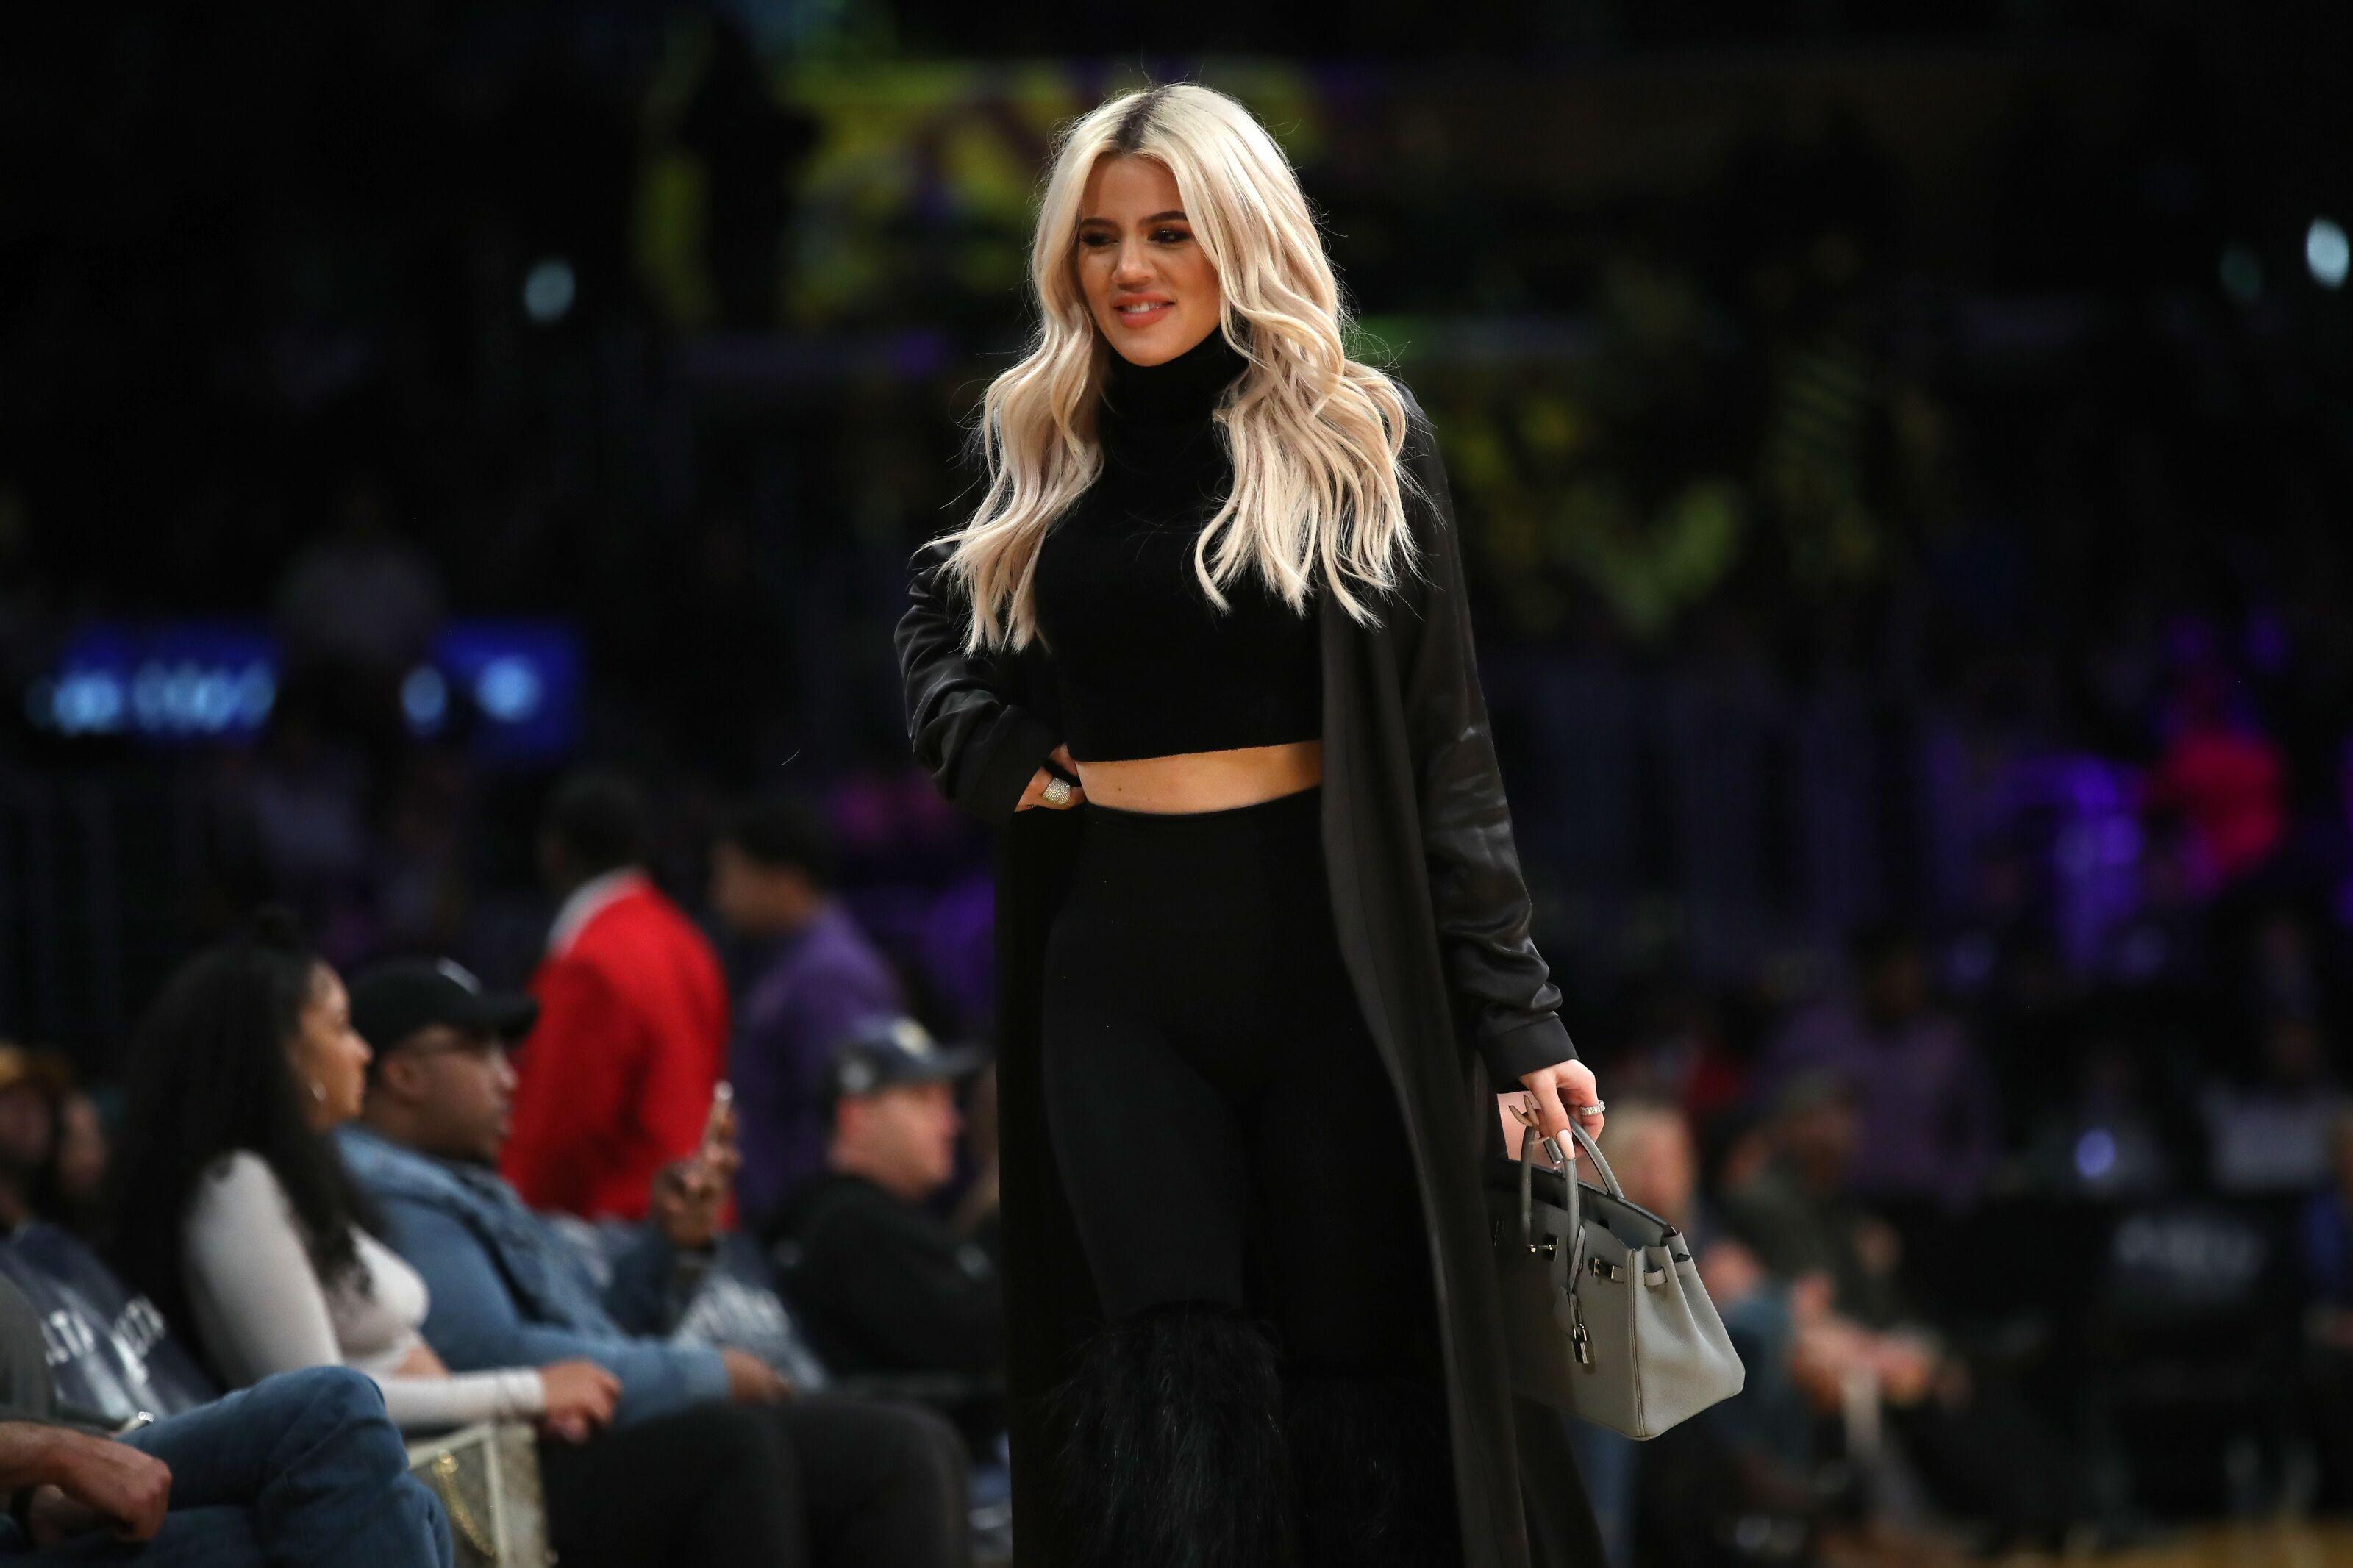 283239064f266 Khloe Kardashian breast surgery rumors soar from sexy Instagram pic